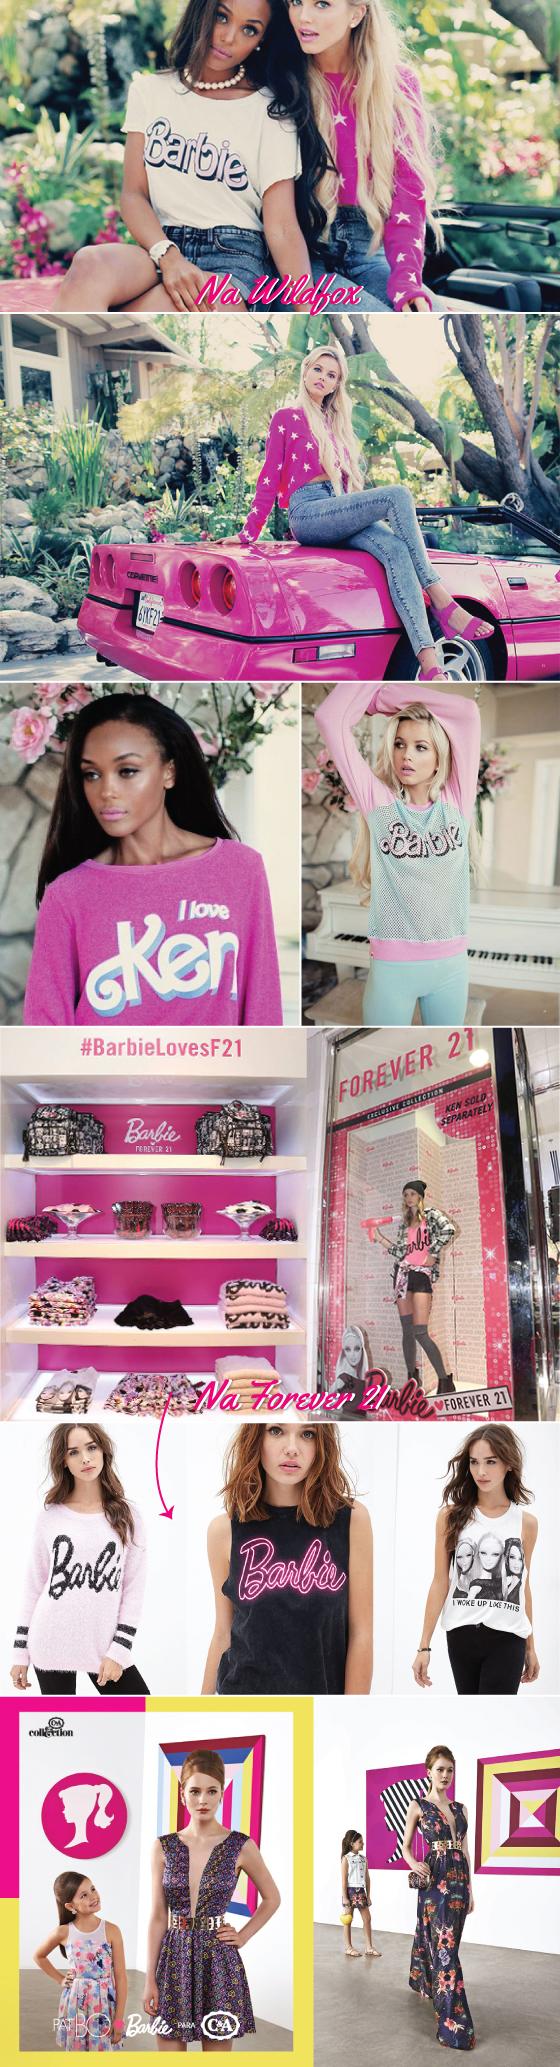 barbie-fever-moschino-desfile-mfw-roupa-fashion-tendencia-wildfox-forever-21-pat-bo-c&a